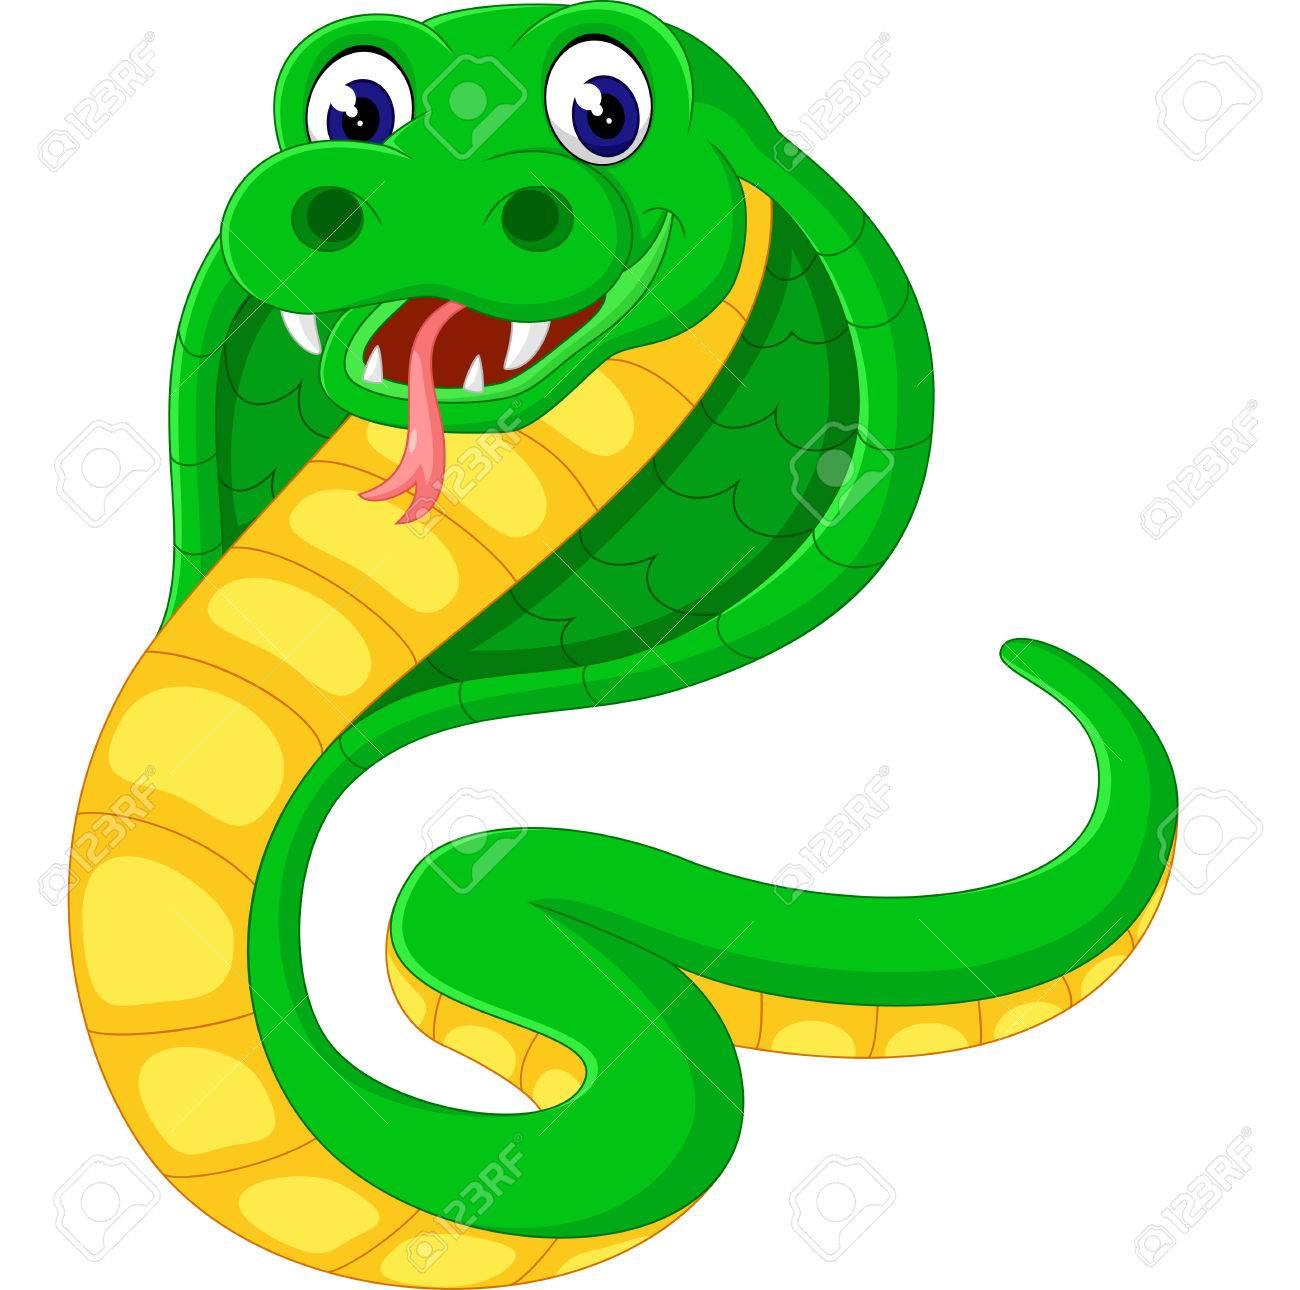 Dessin Cobra dessin animé cobra banque d'images et photos libres de droits. image